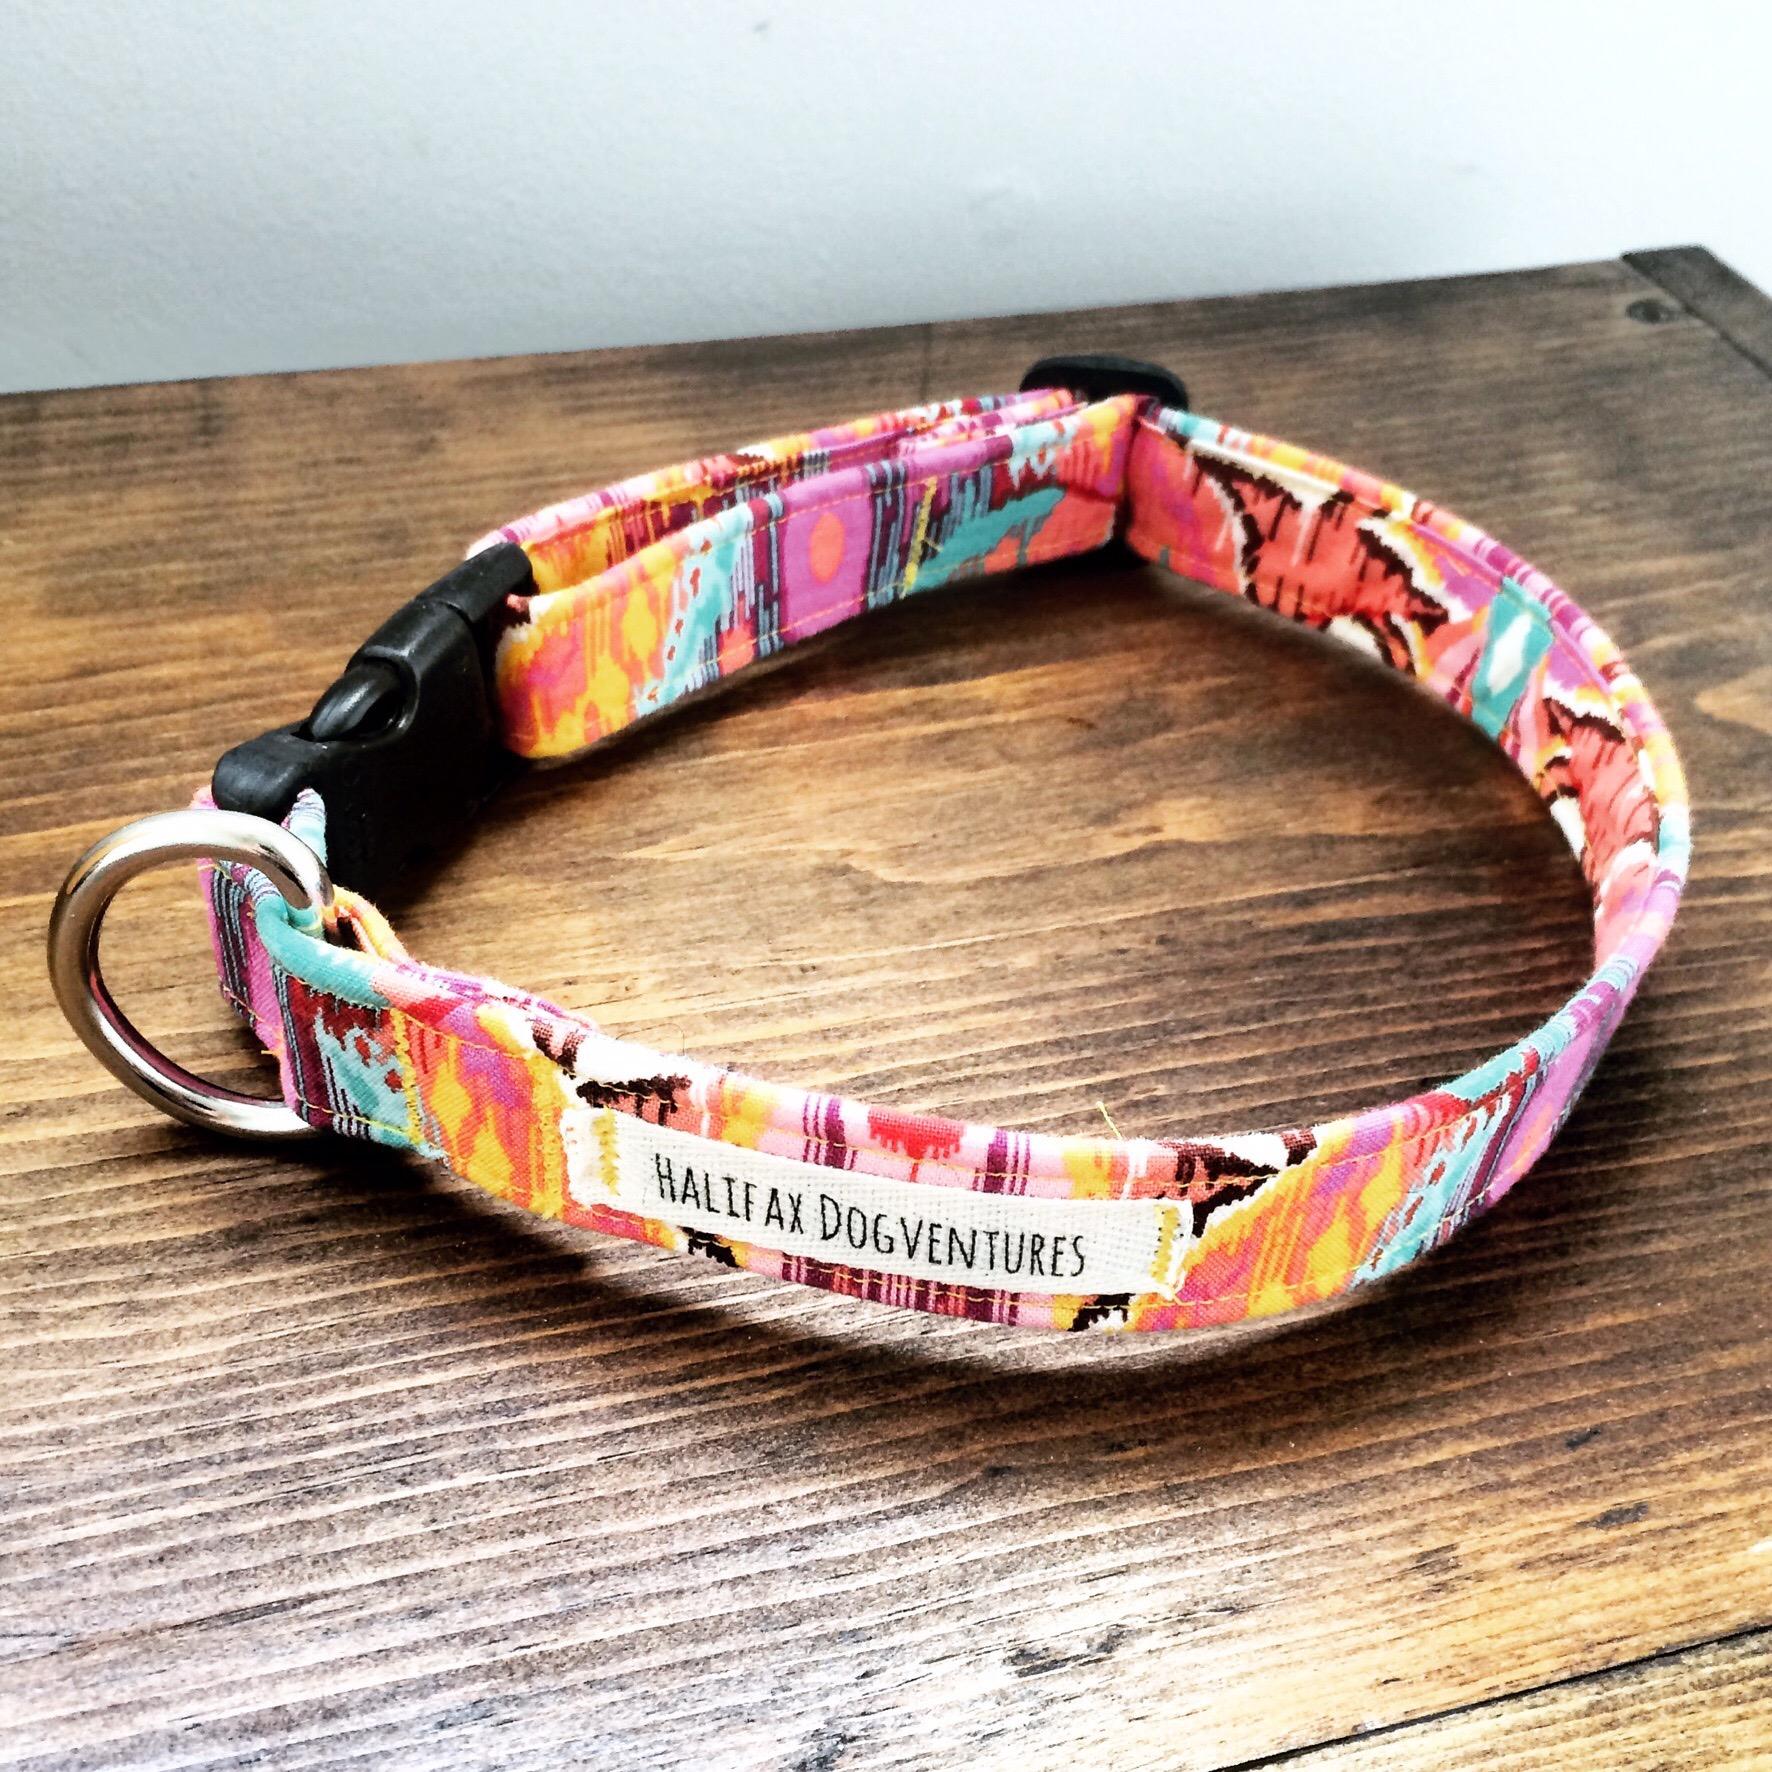 Diy adjustable dog collar tutorial halifax dogventures img7430g jeuxipadfo Gallery